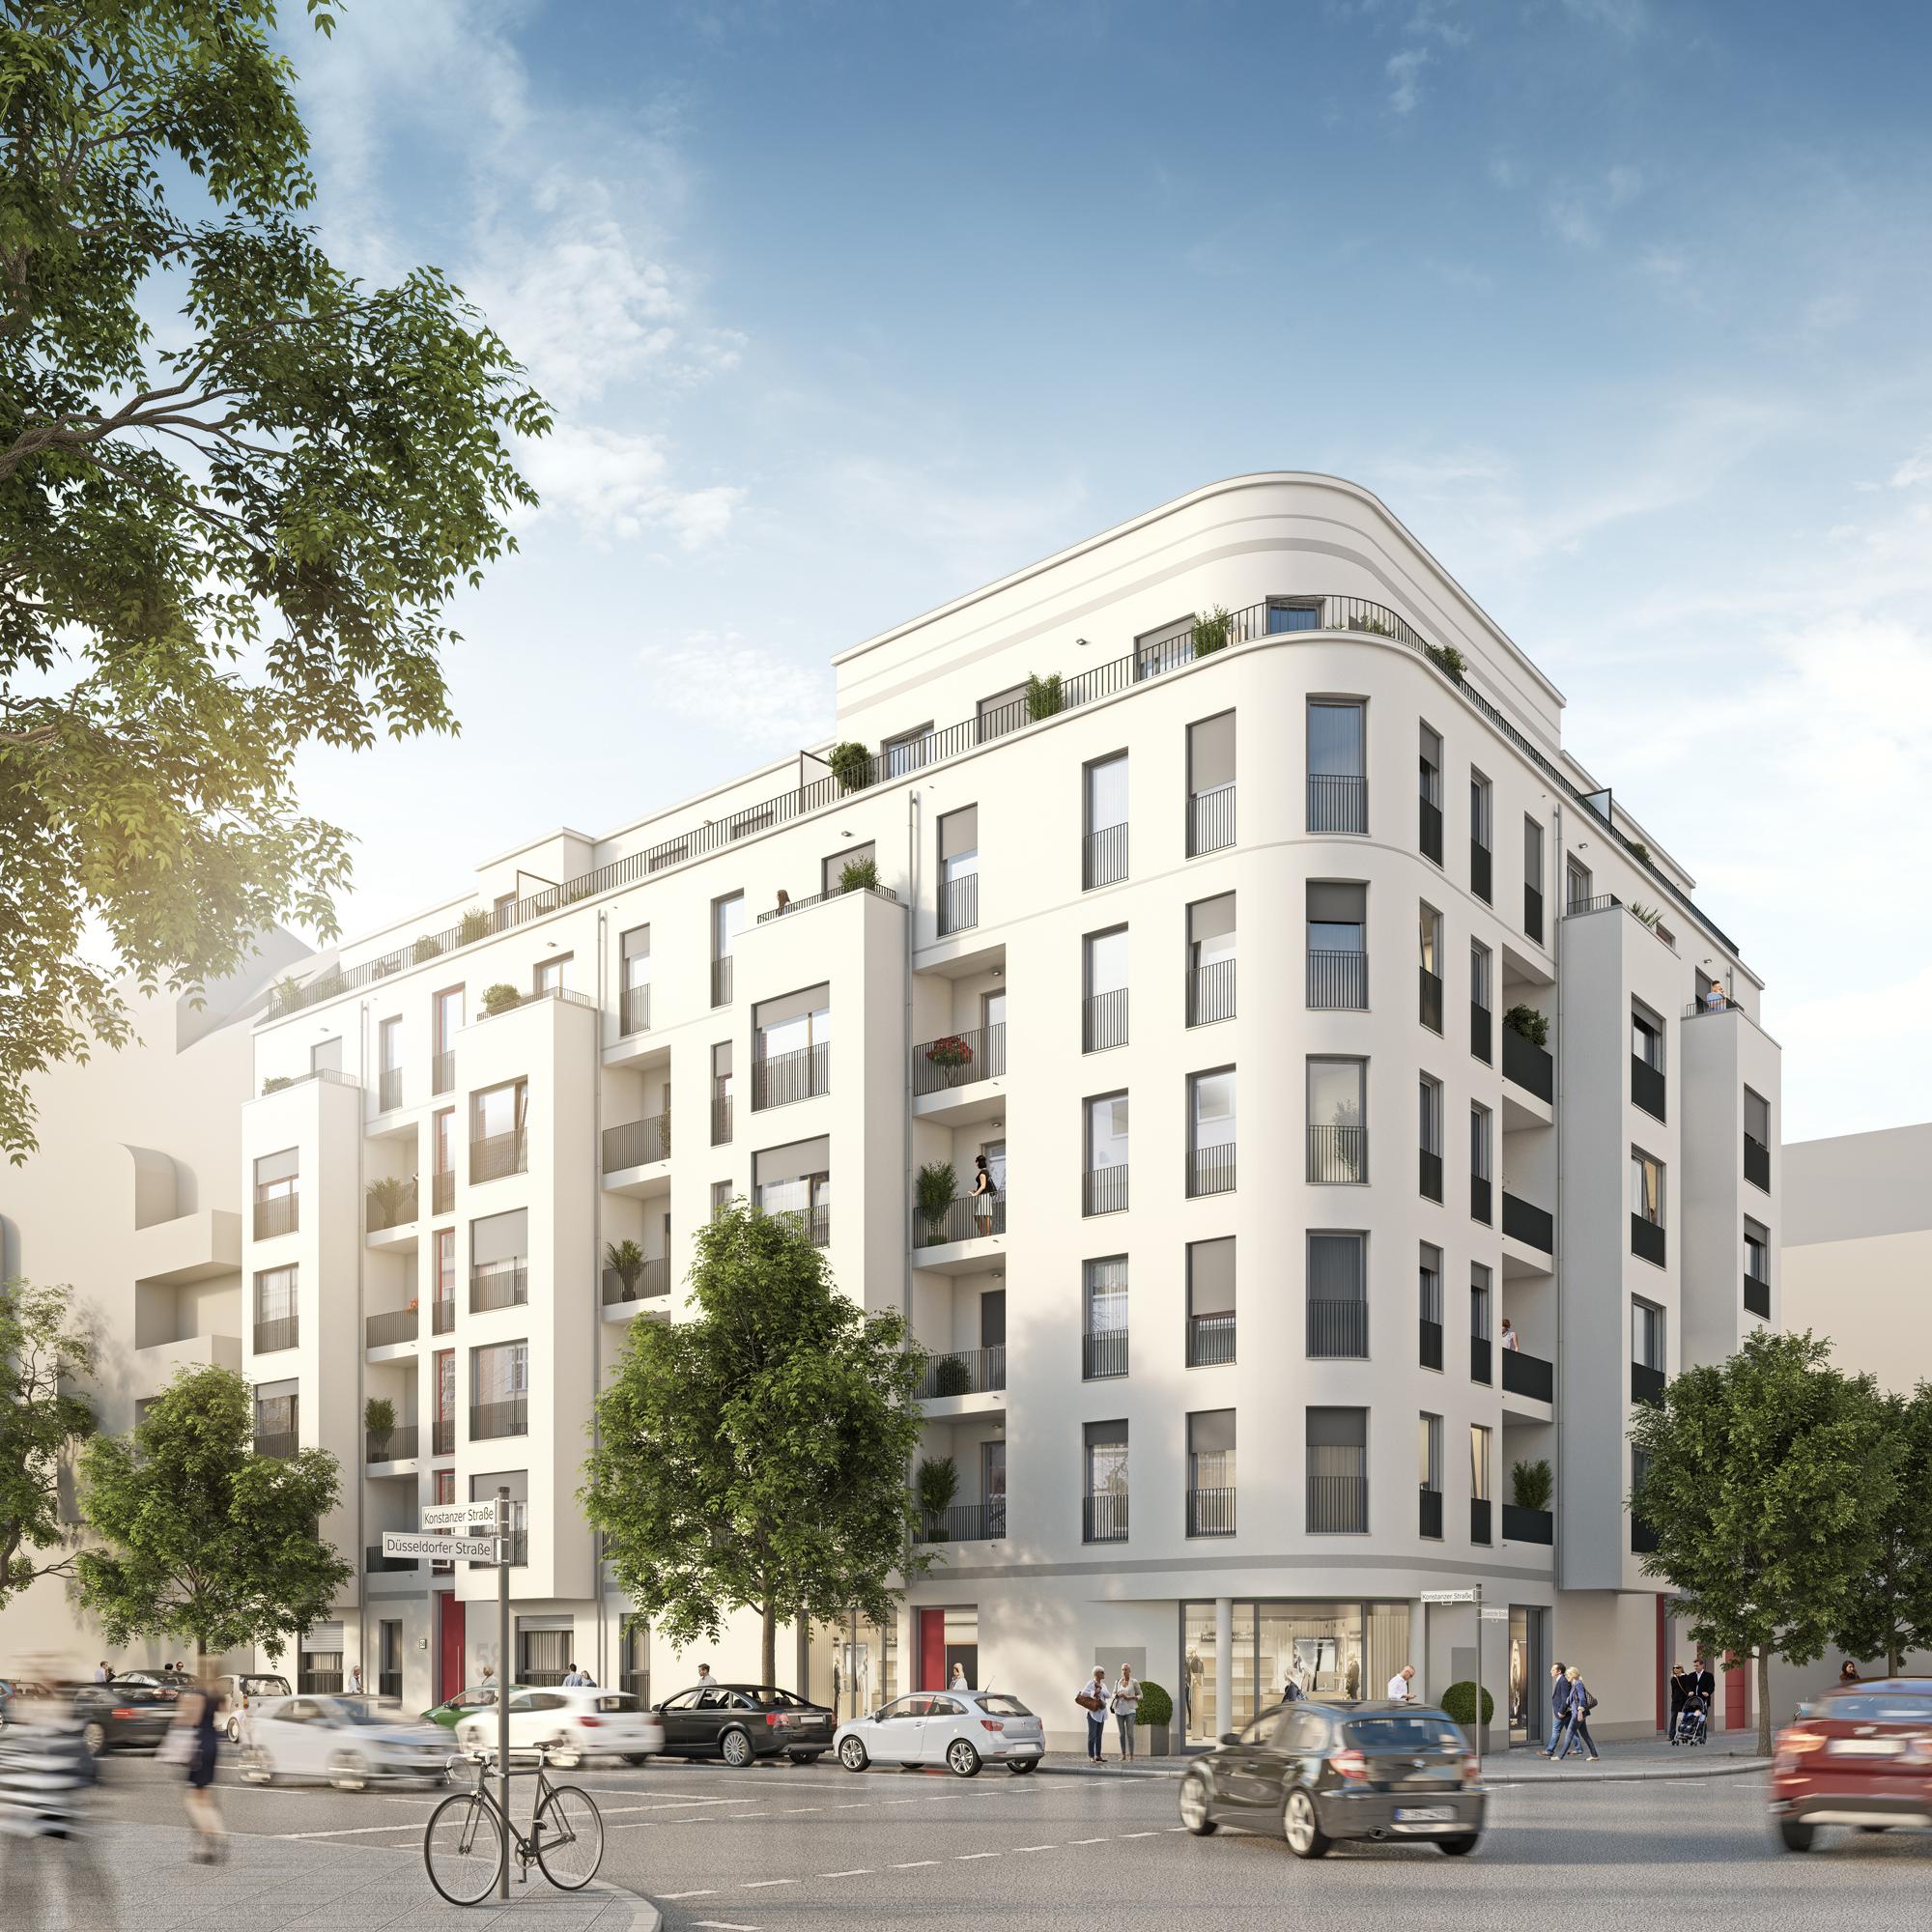 K58 konstanzer stra e a6 architekten for Mehrfamilienhaus berlin